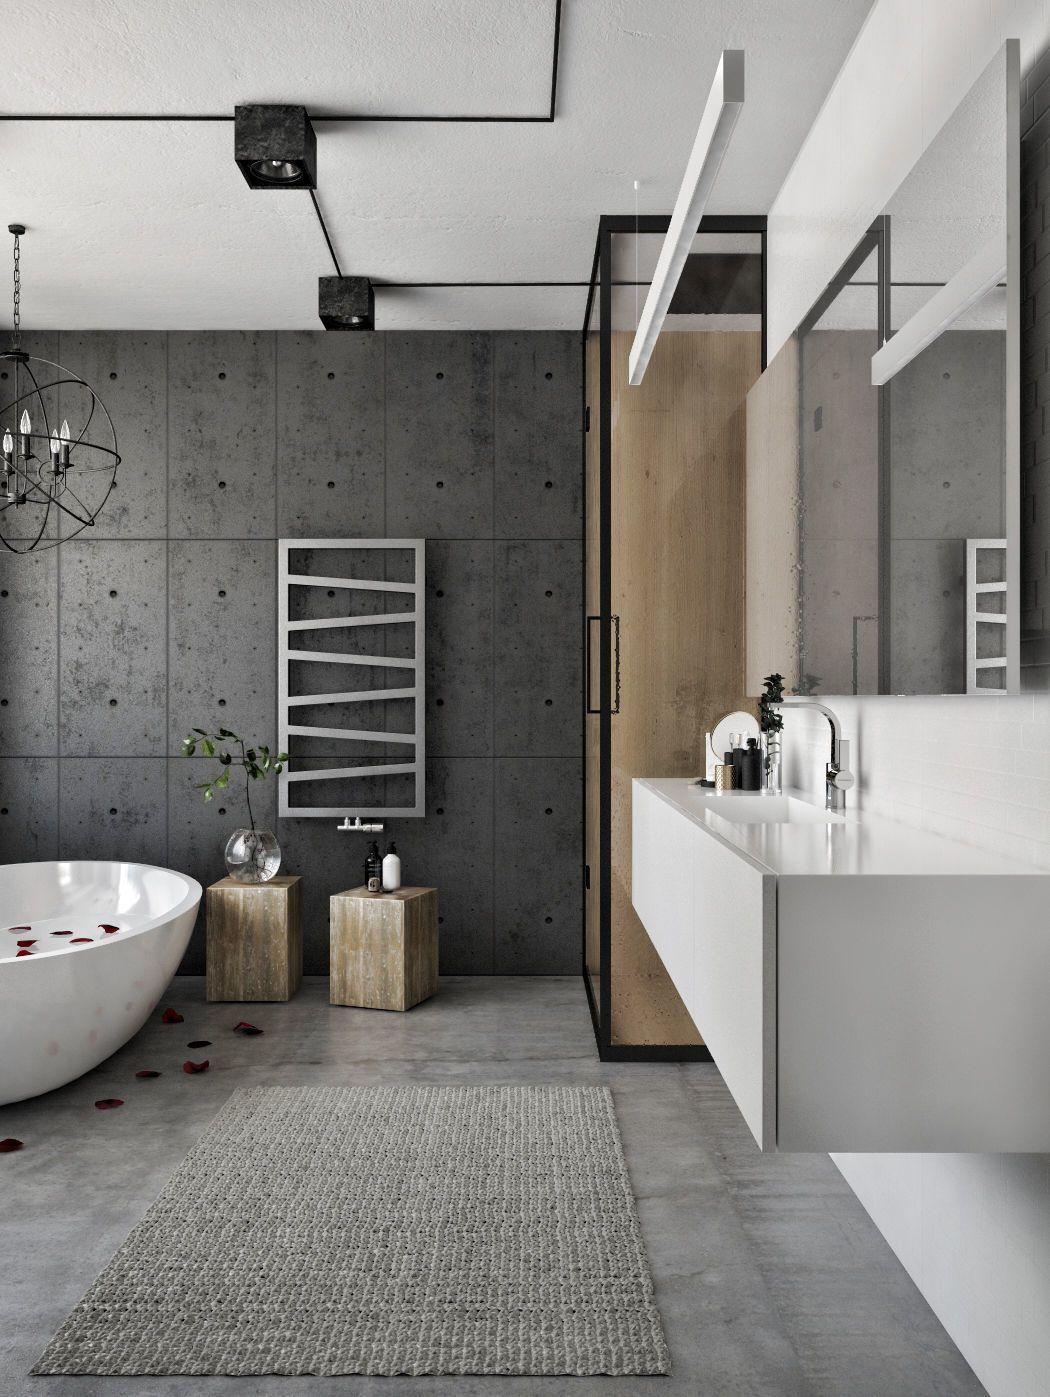 3d Model Modern Loft Cgtrader Design Creative Home Ideas Bathroom Sink Mirror Unique Bathroom Decor Industrial Bathroom Decor Loft Interior Design